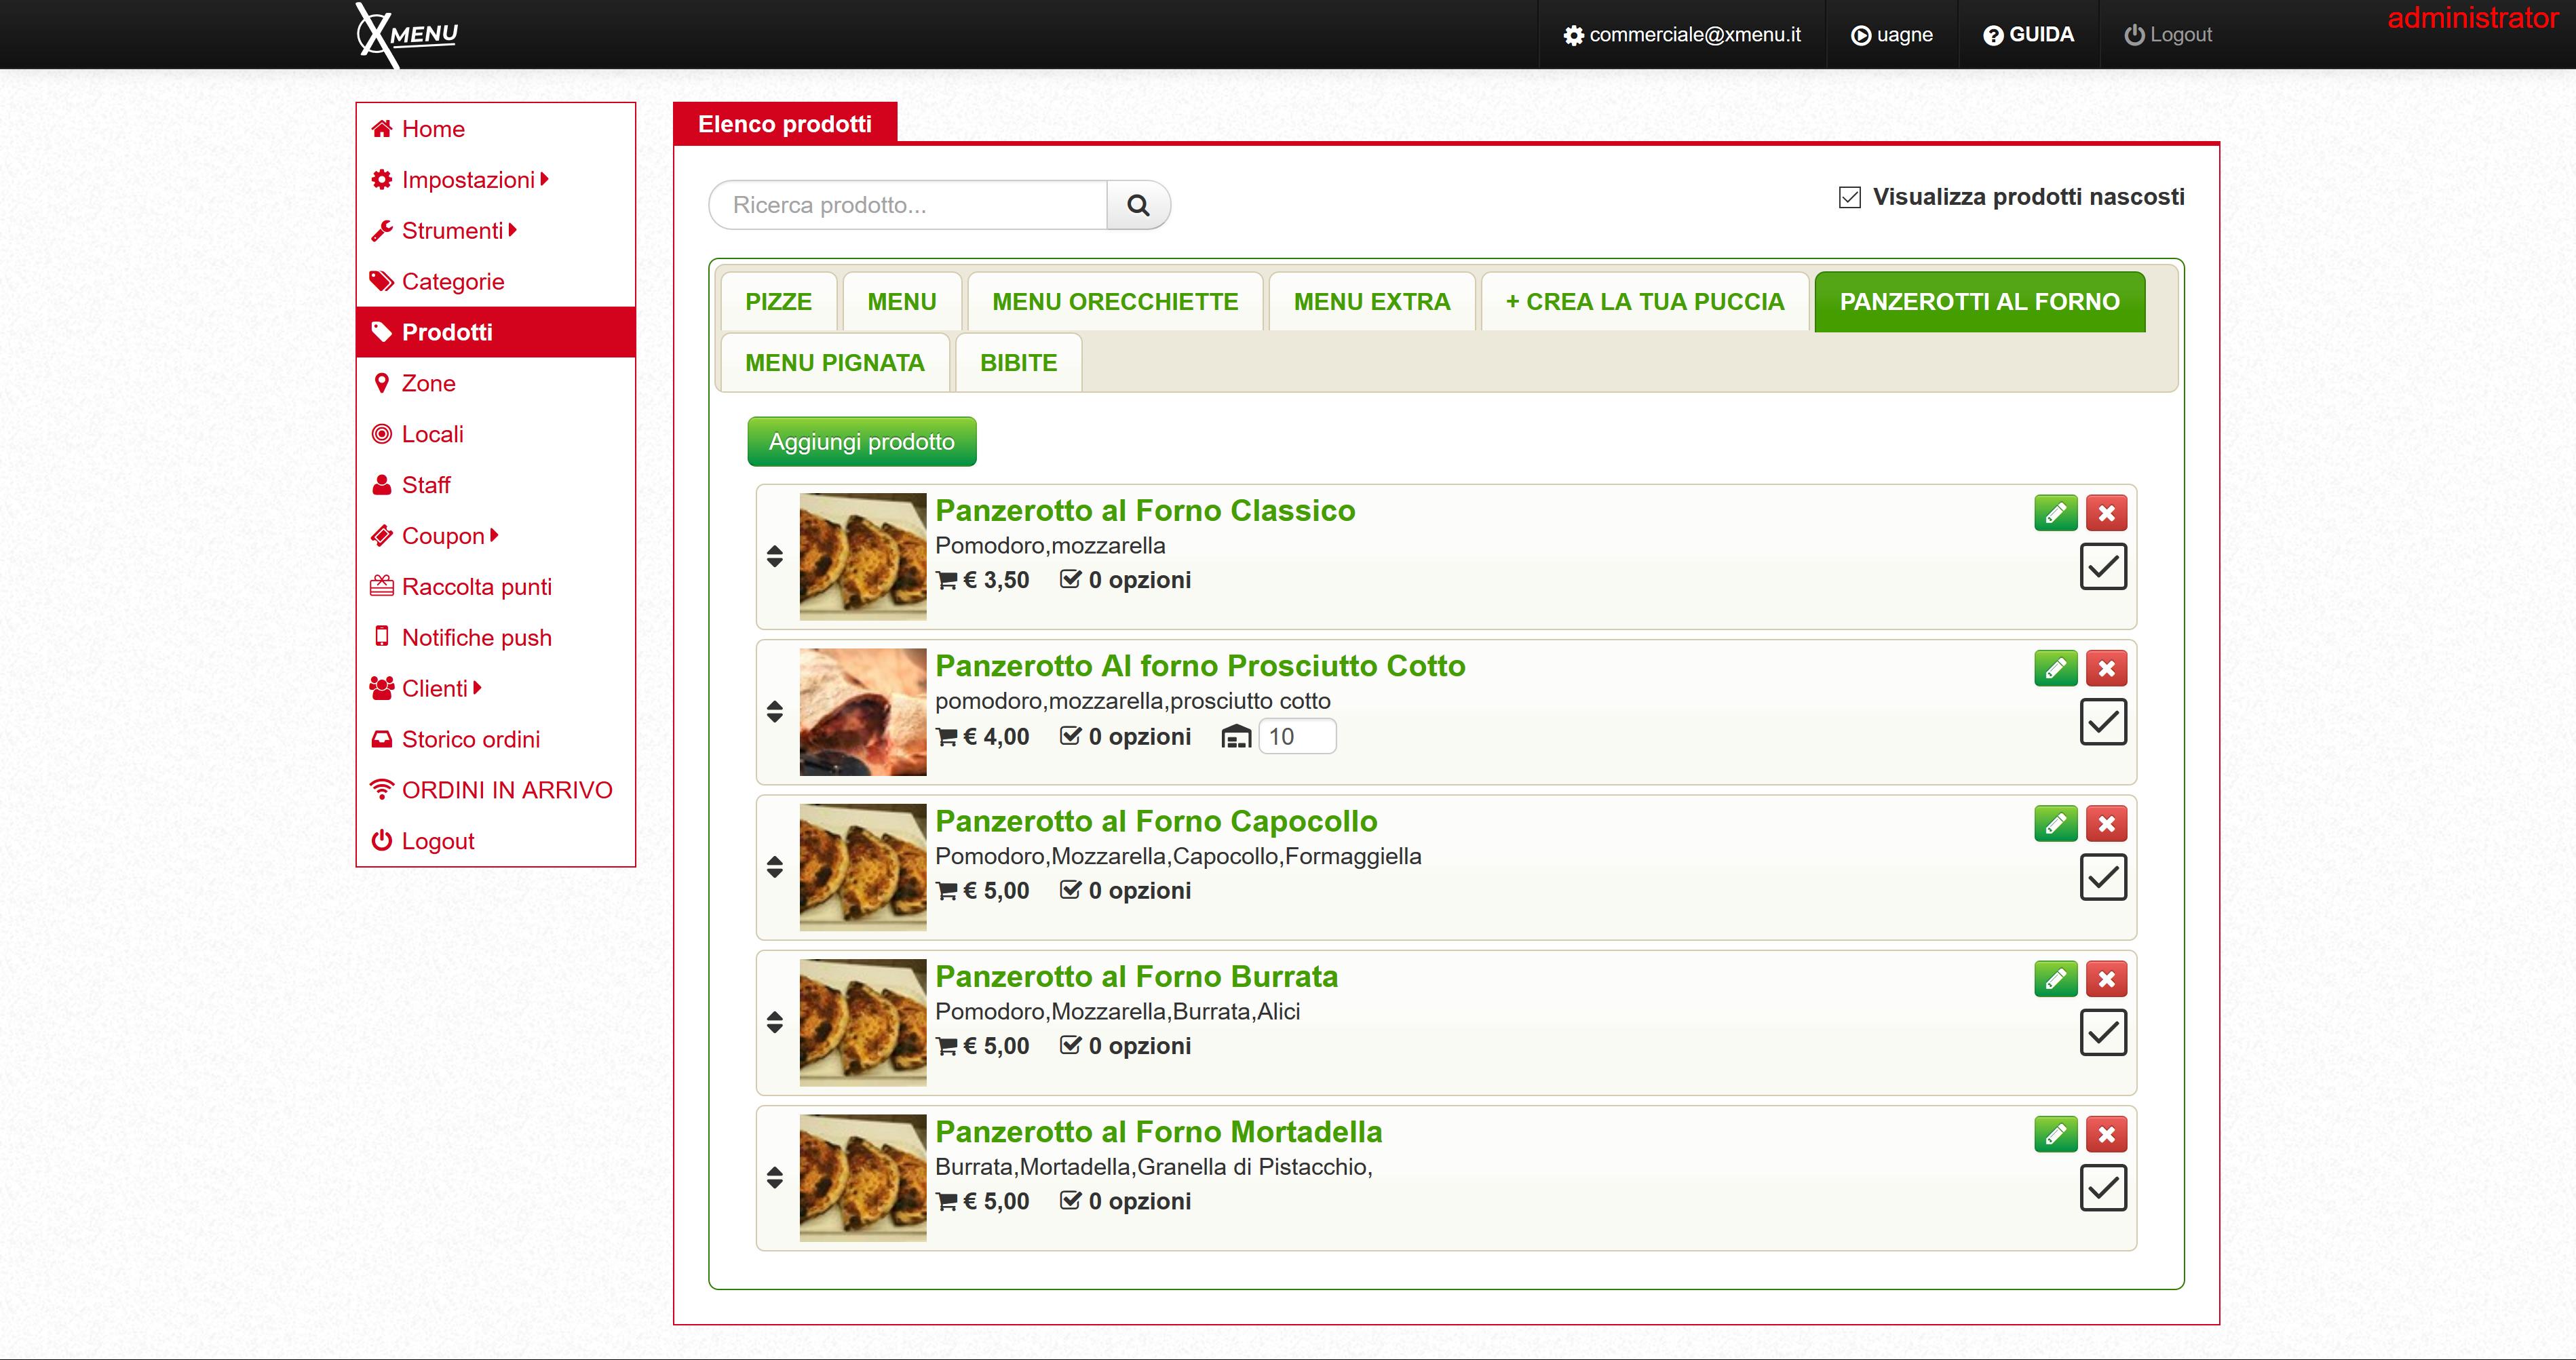 Firefox_Screenshot_2020-01-09T15-07-06.344Z